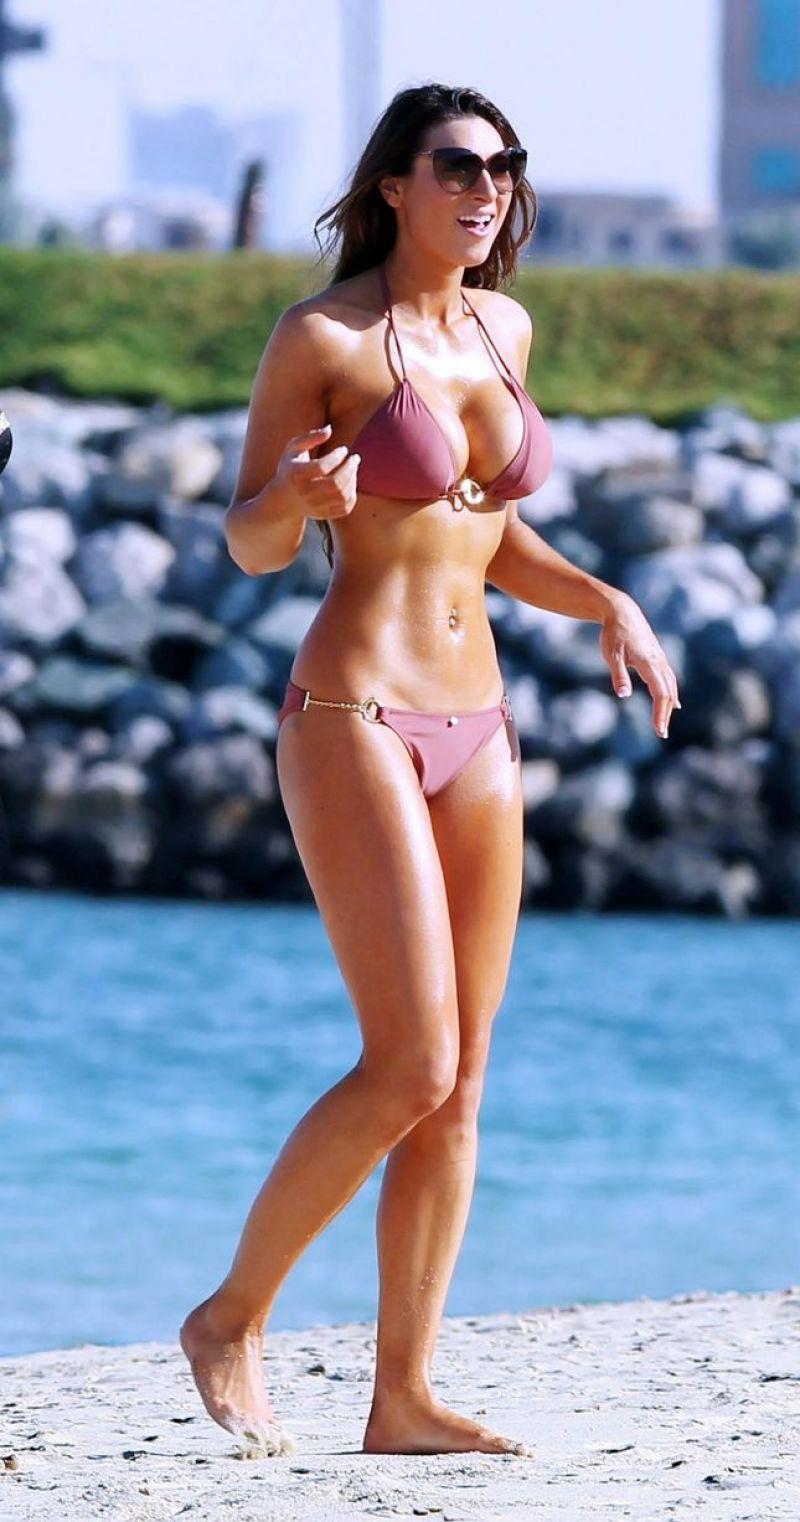 Luisa Zissman In A Bikini Dubai December 2013